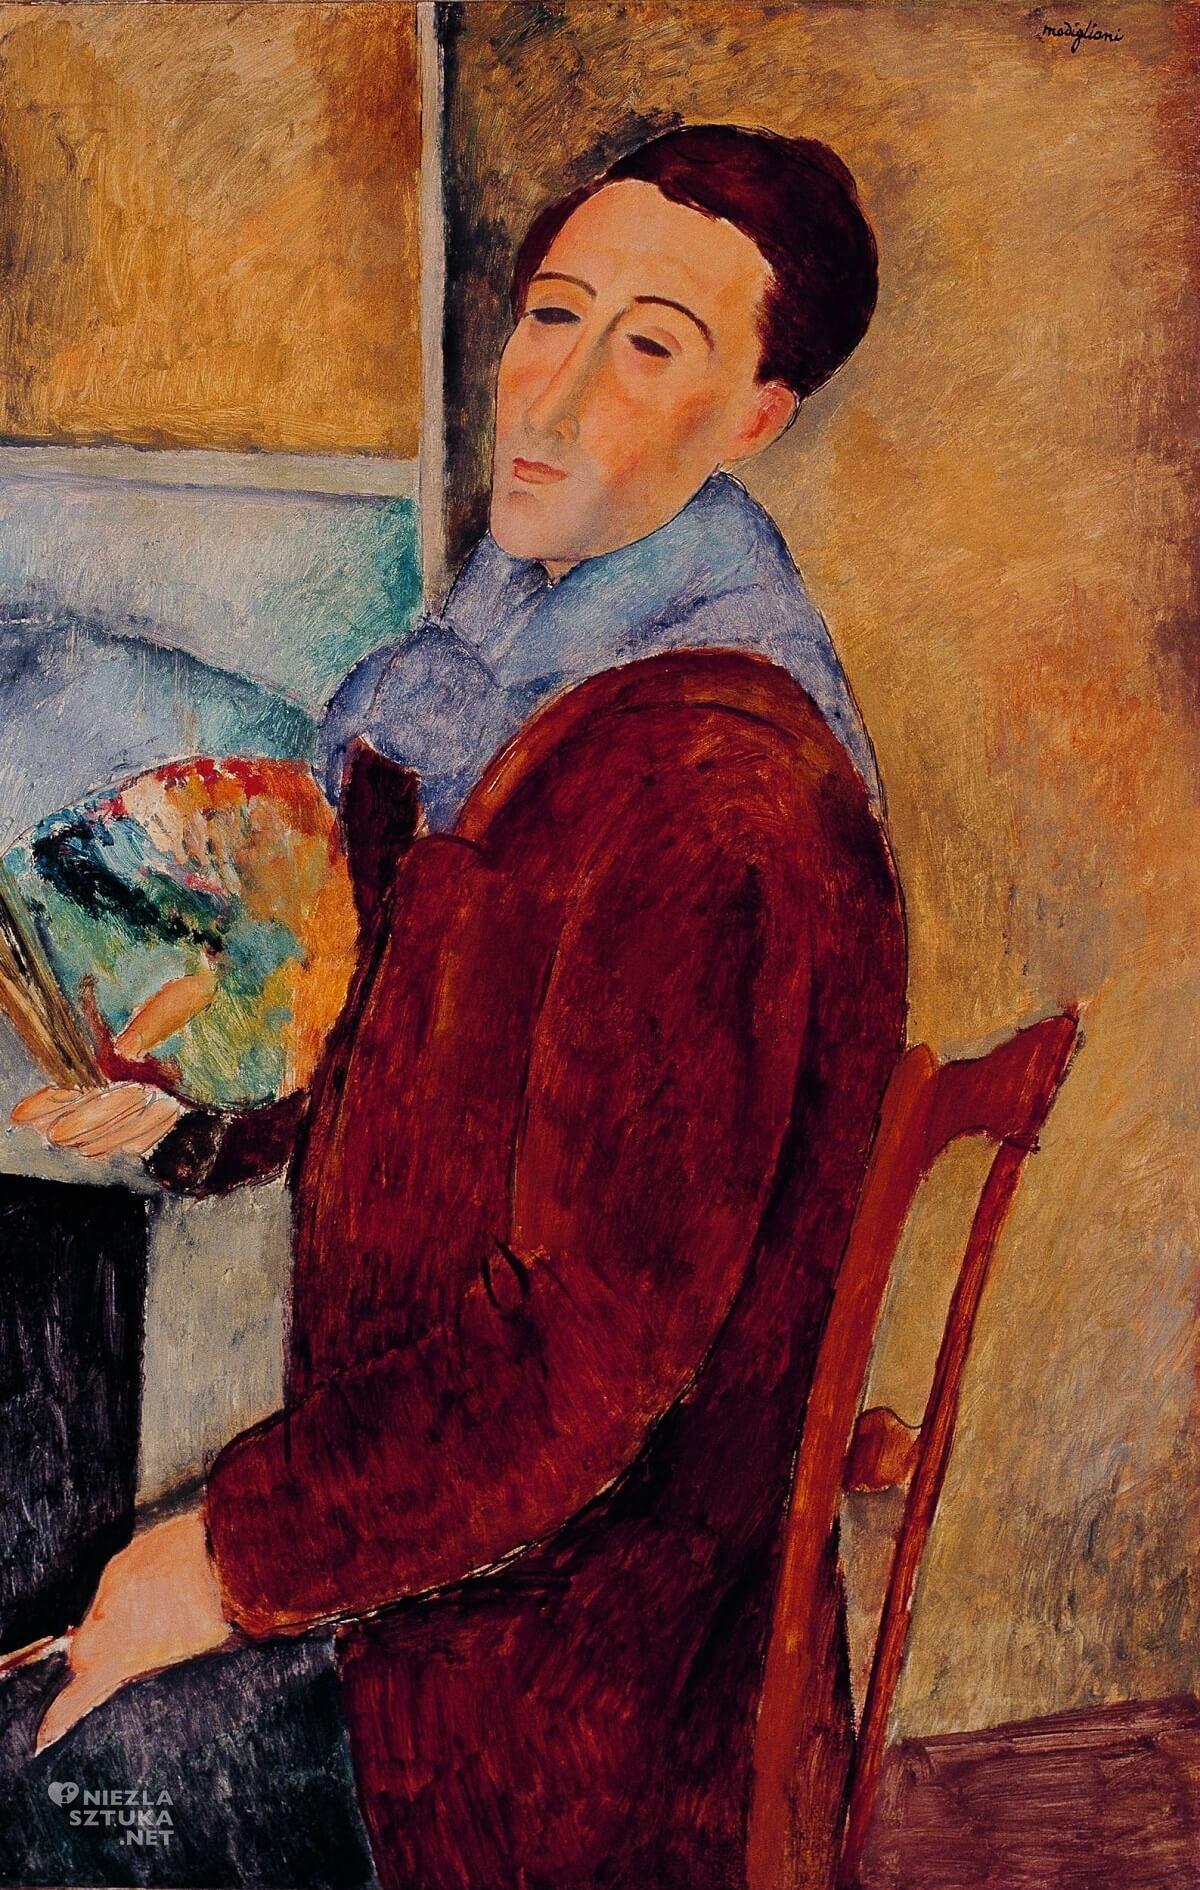 Amedeo Modigliani, Autoportret, malarz, Niezła sztuka